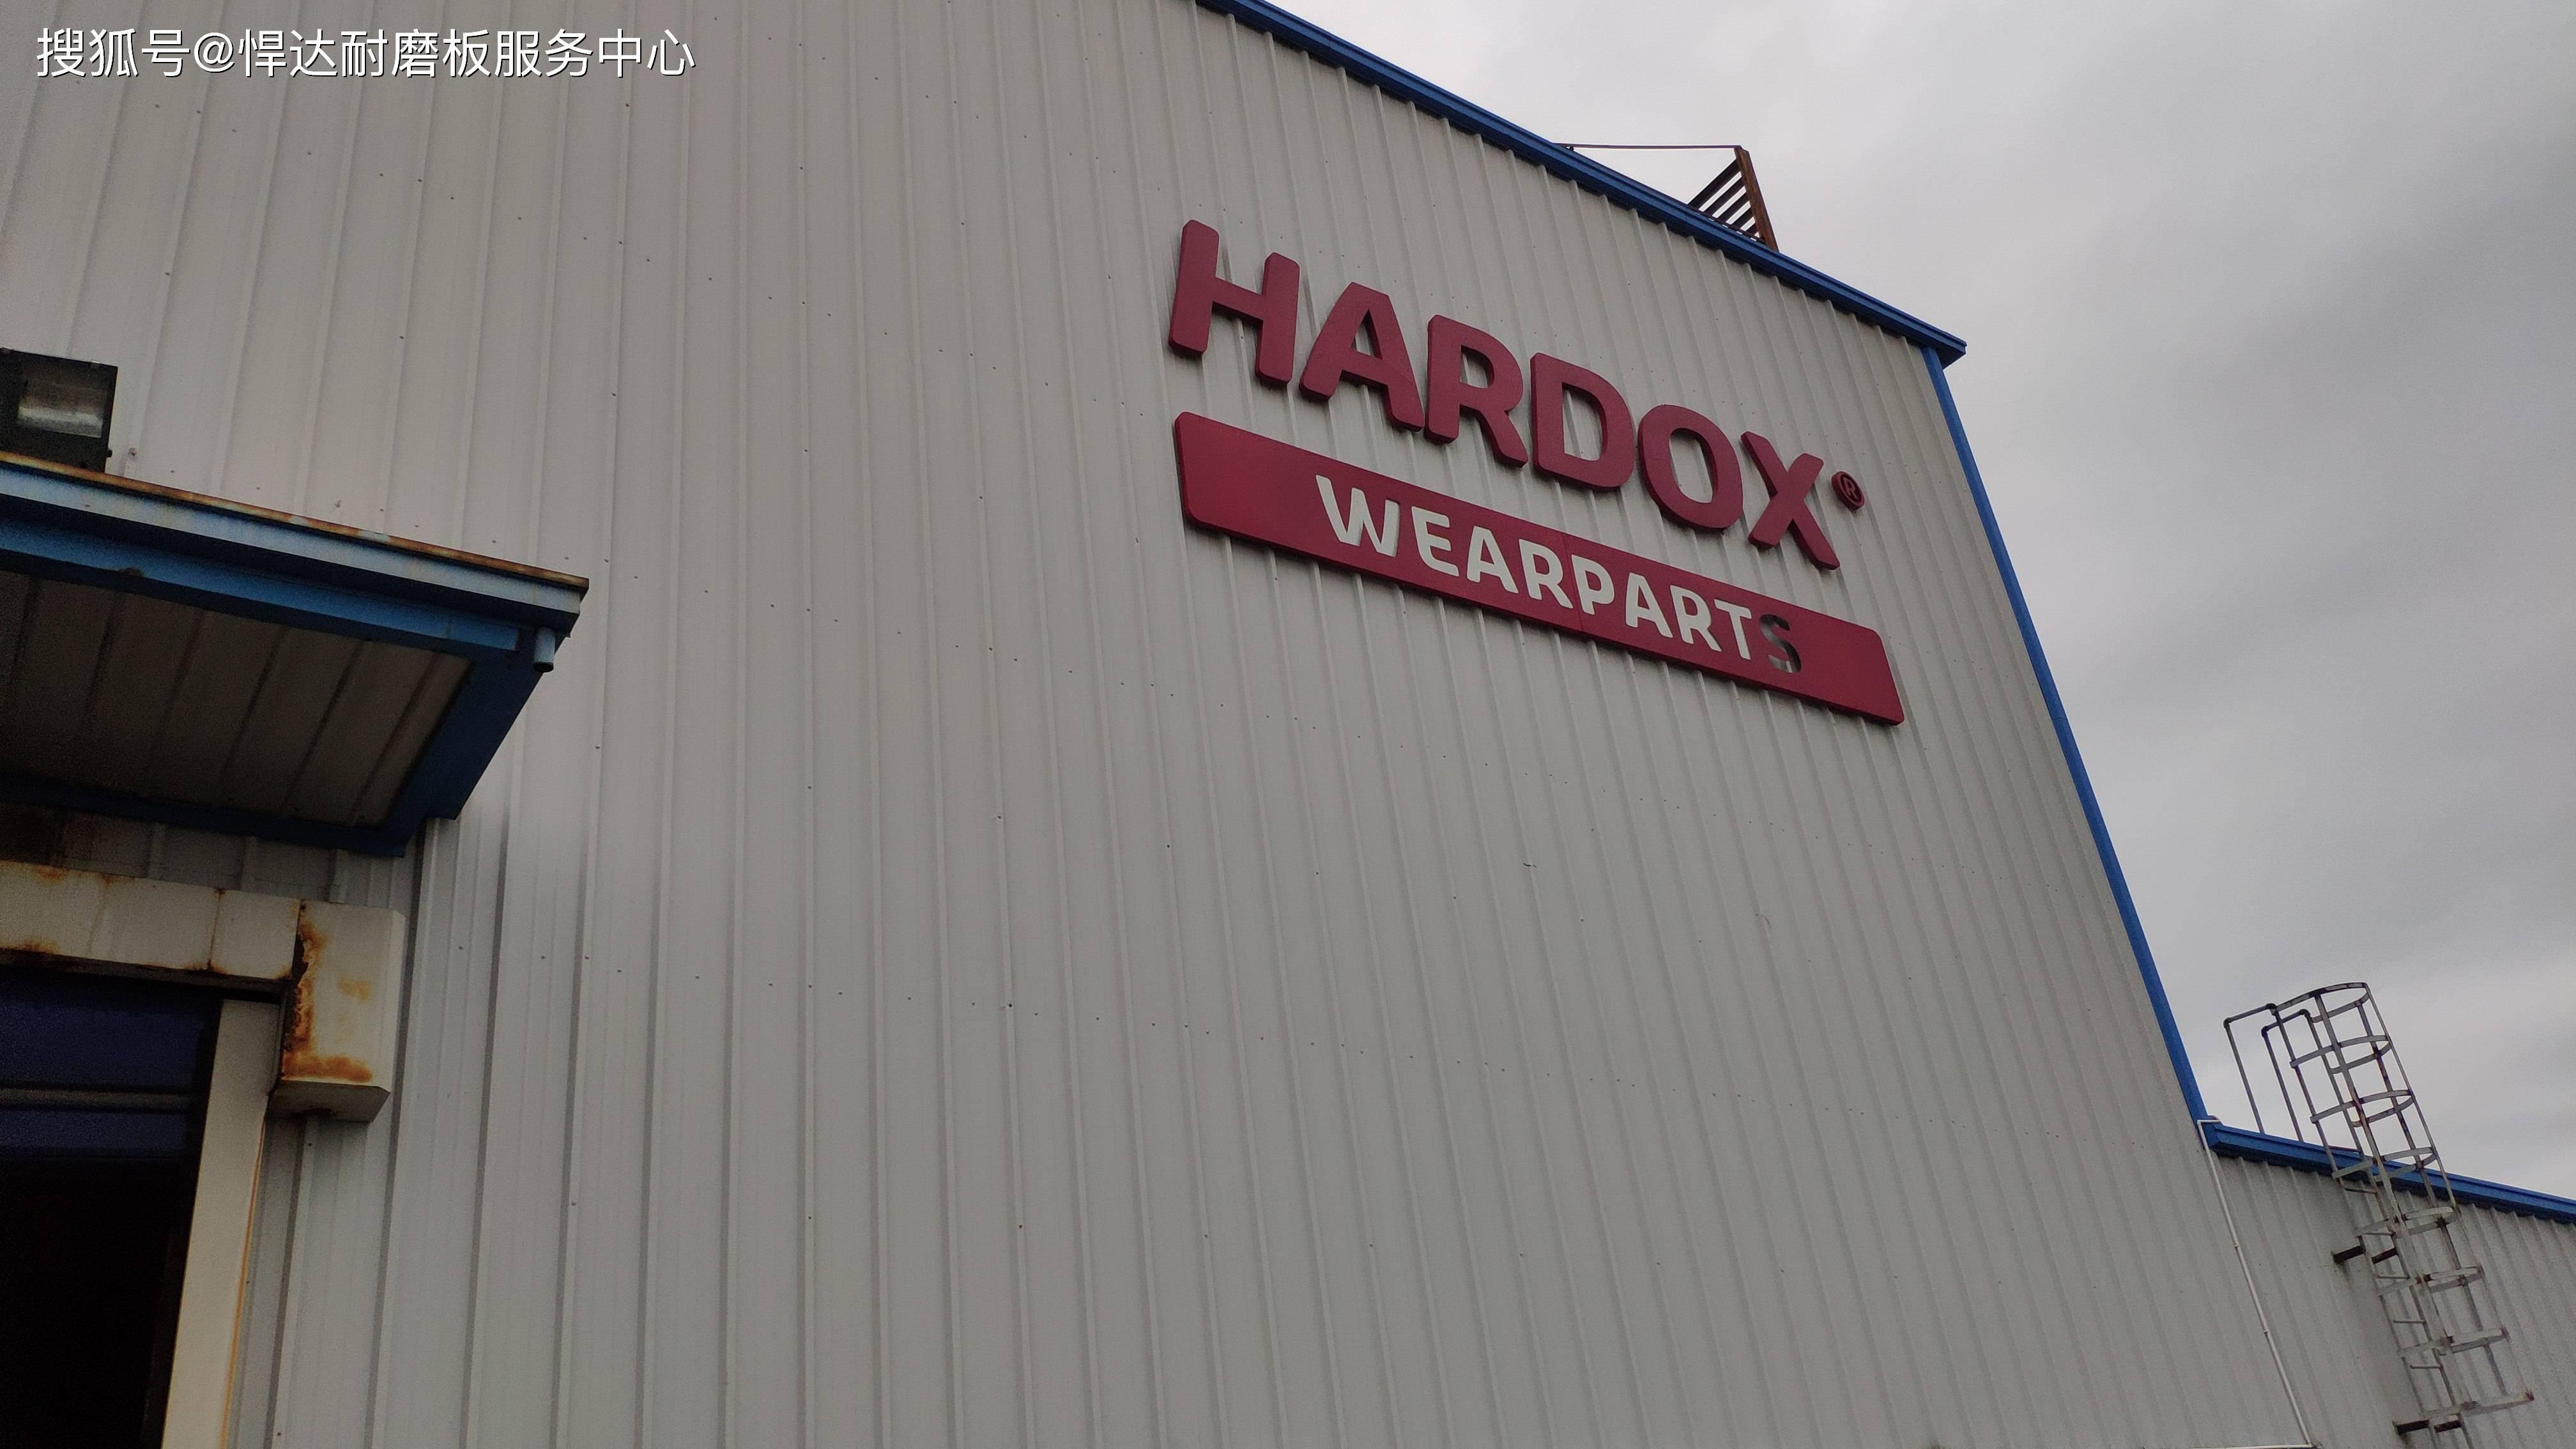 Hardox耐磨板,悍达耐磨板,悍达中心